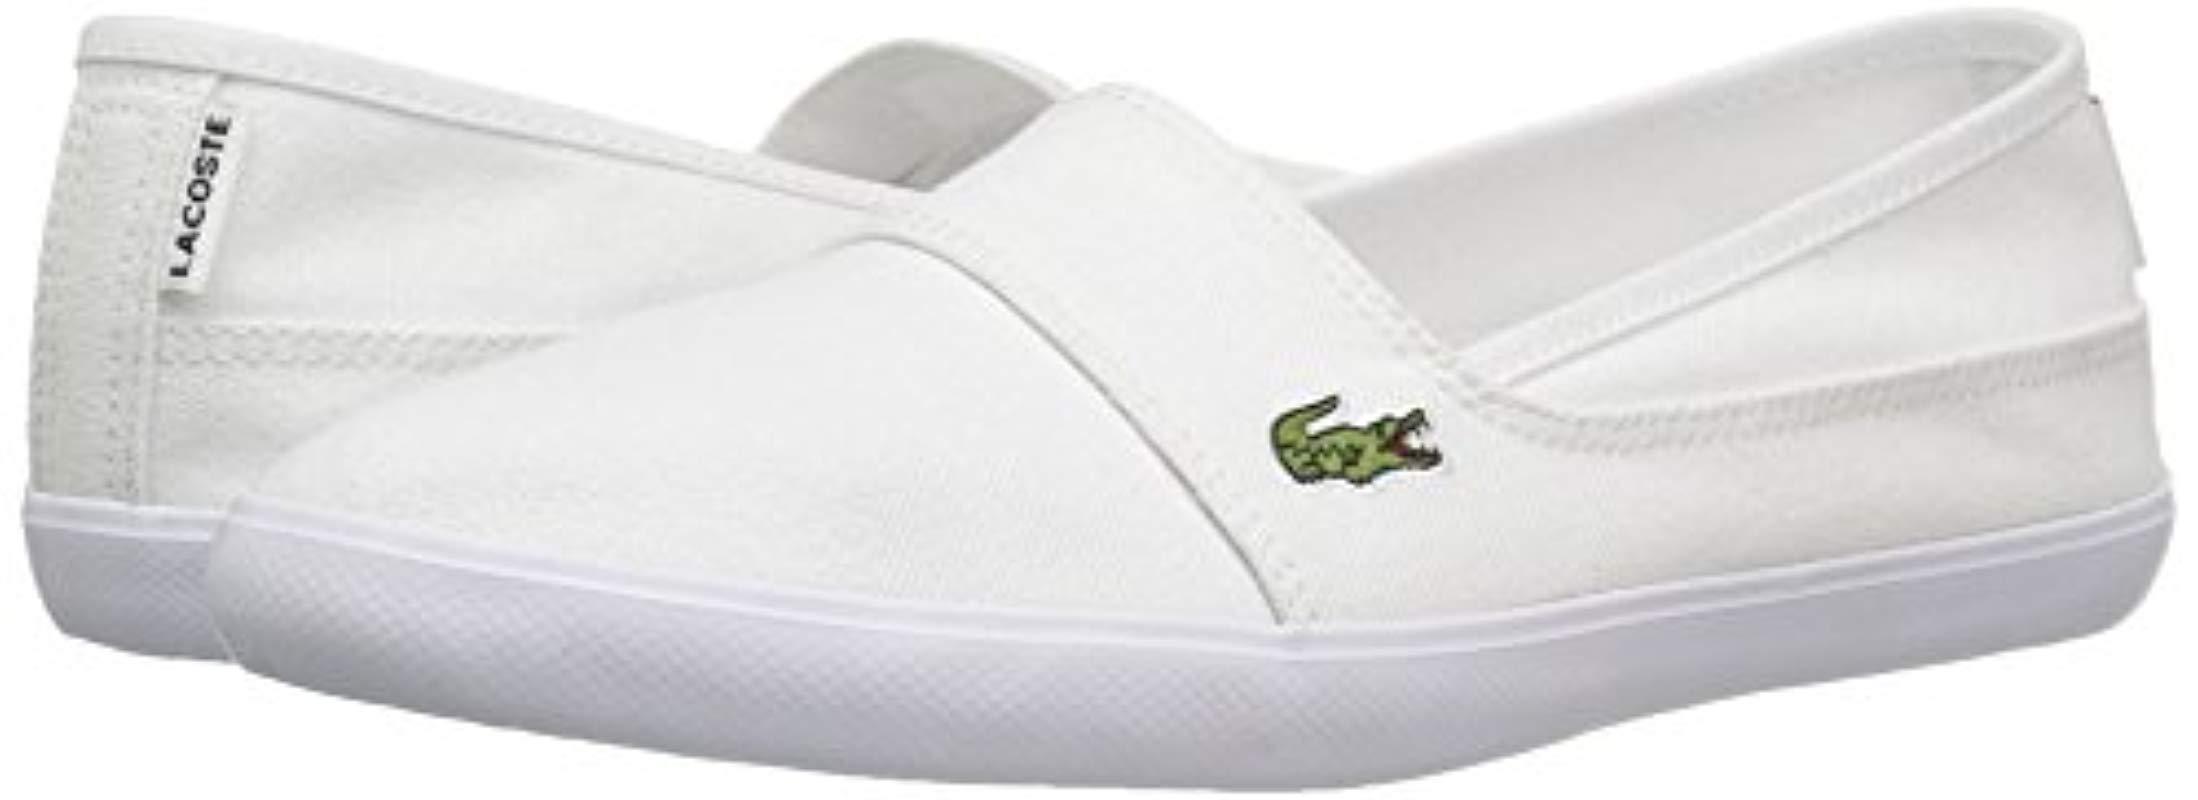 best deals on super quality online retailer Marice Canvas Shoes